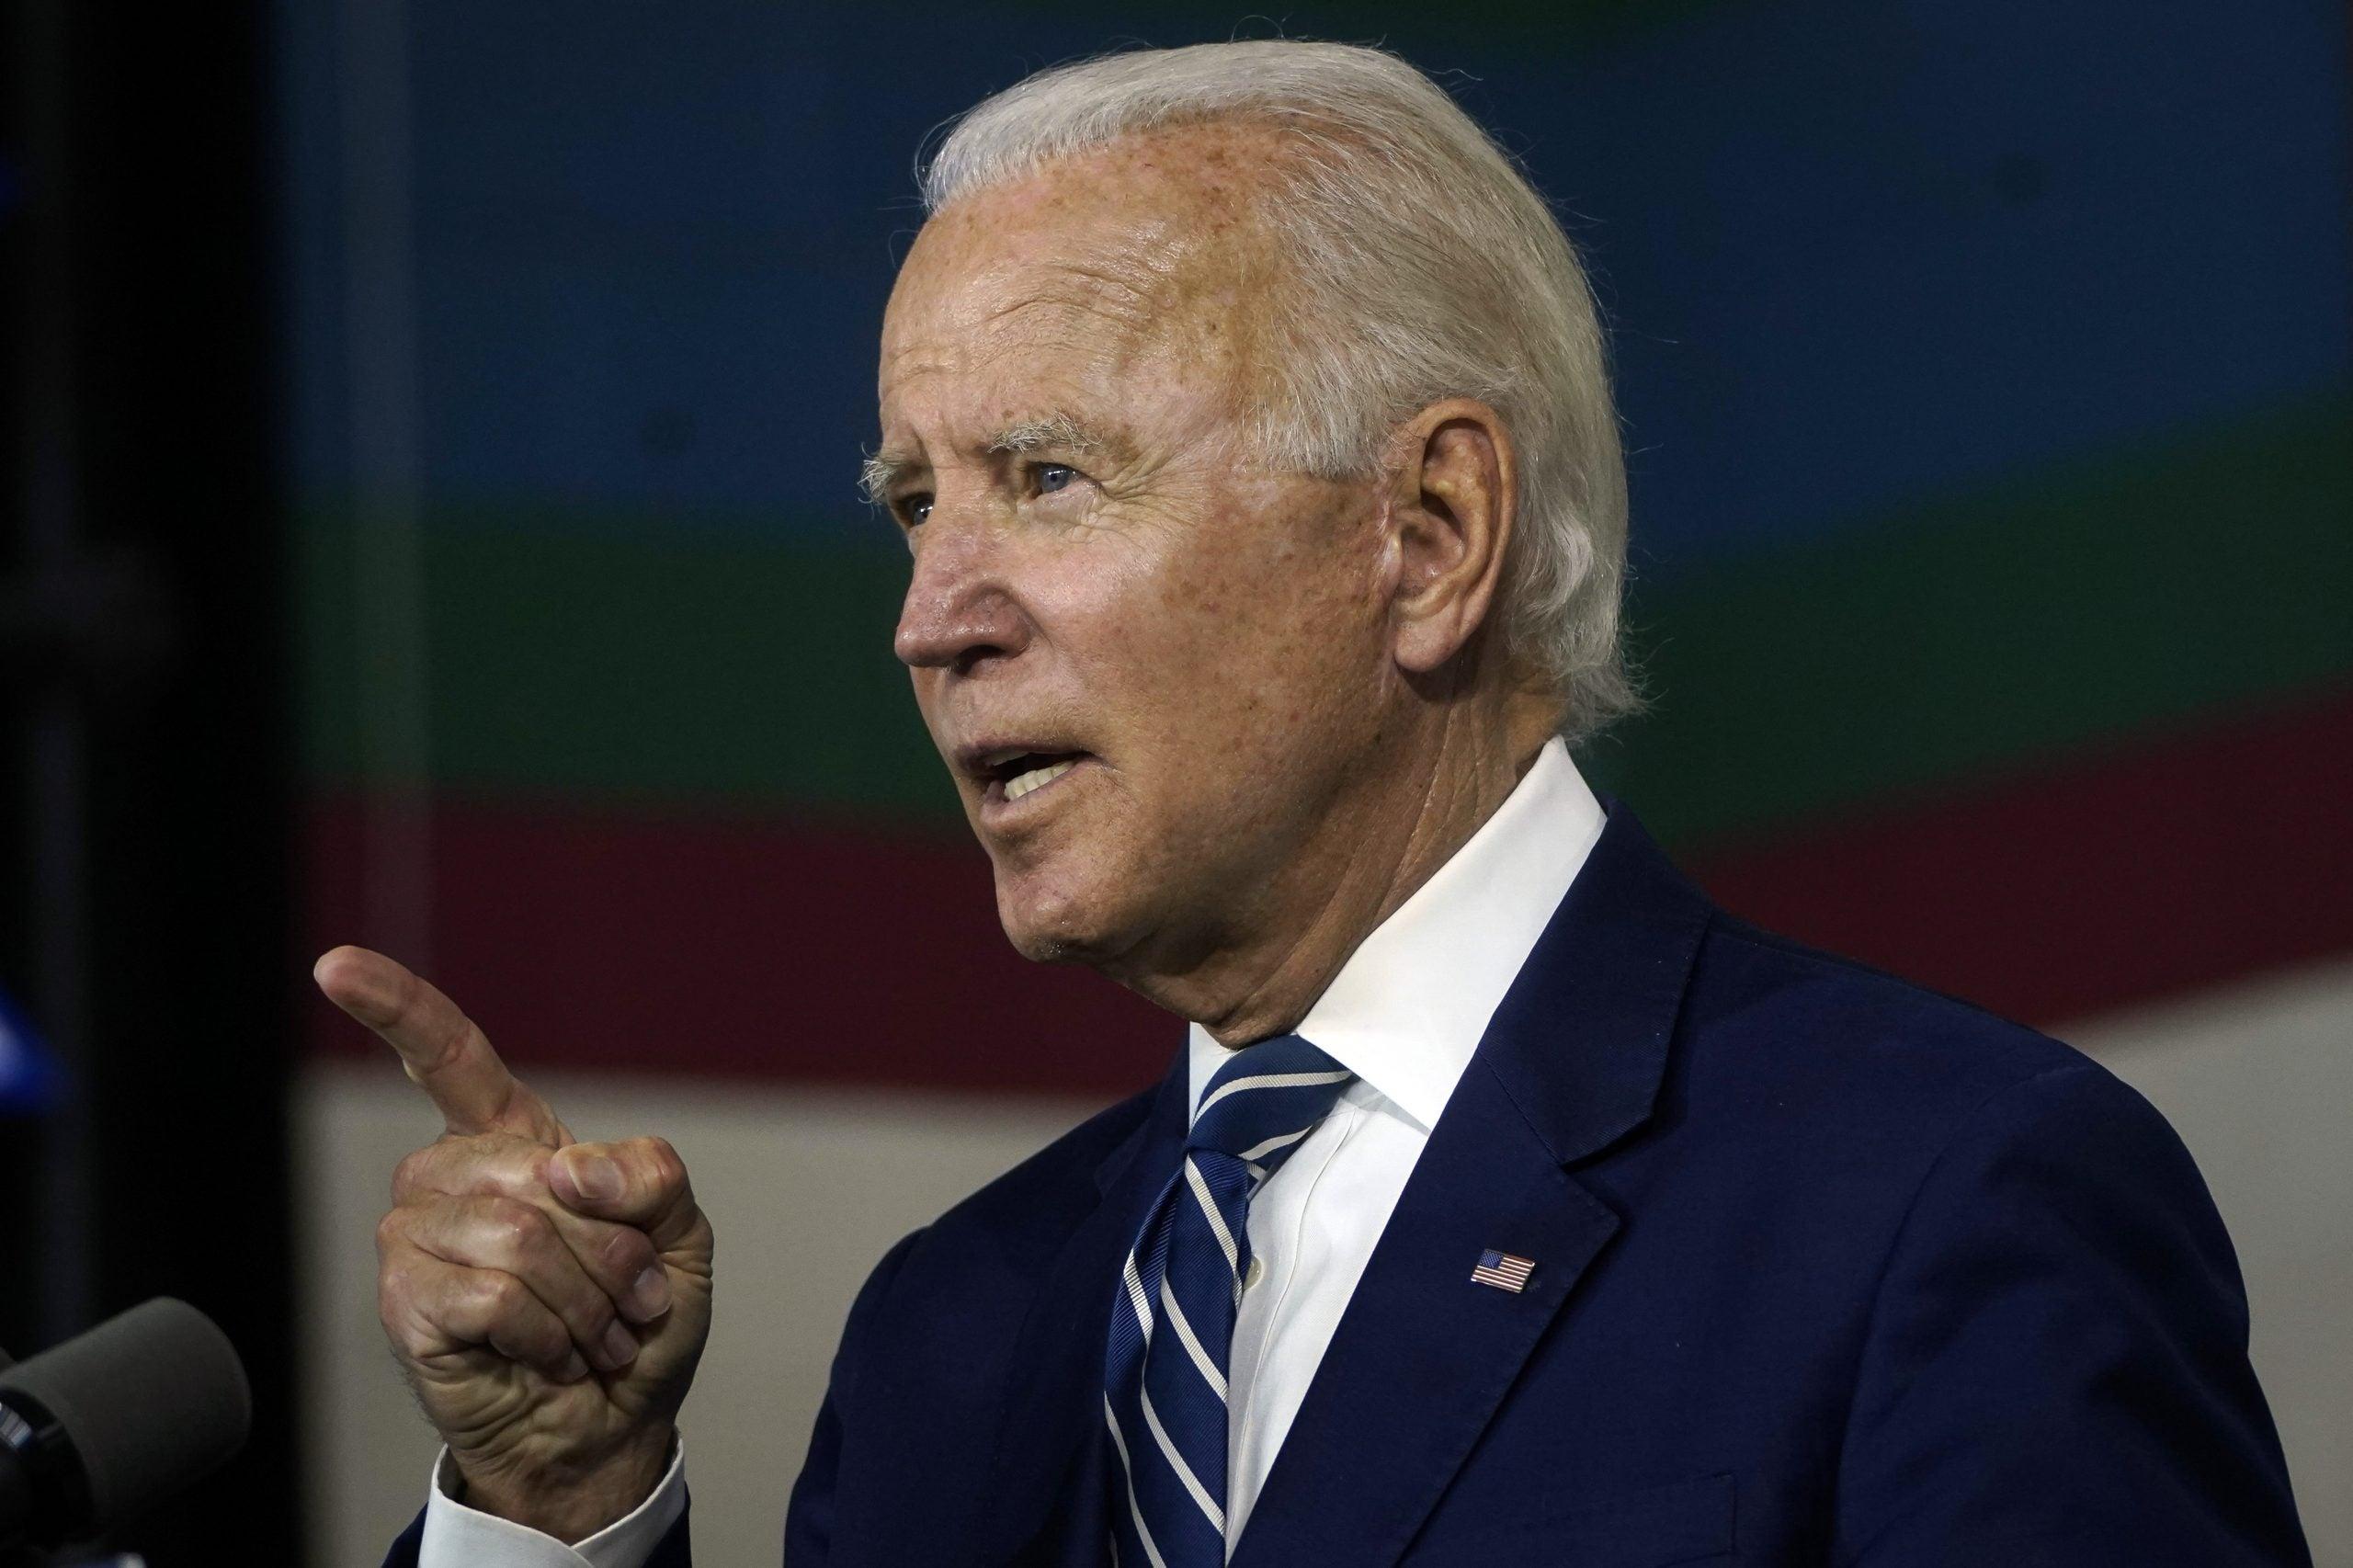 Biden Has Big Plans for First 10 Days